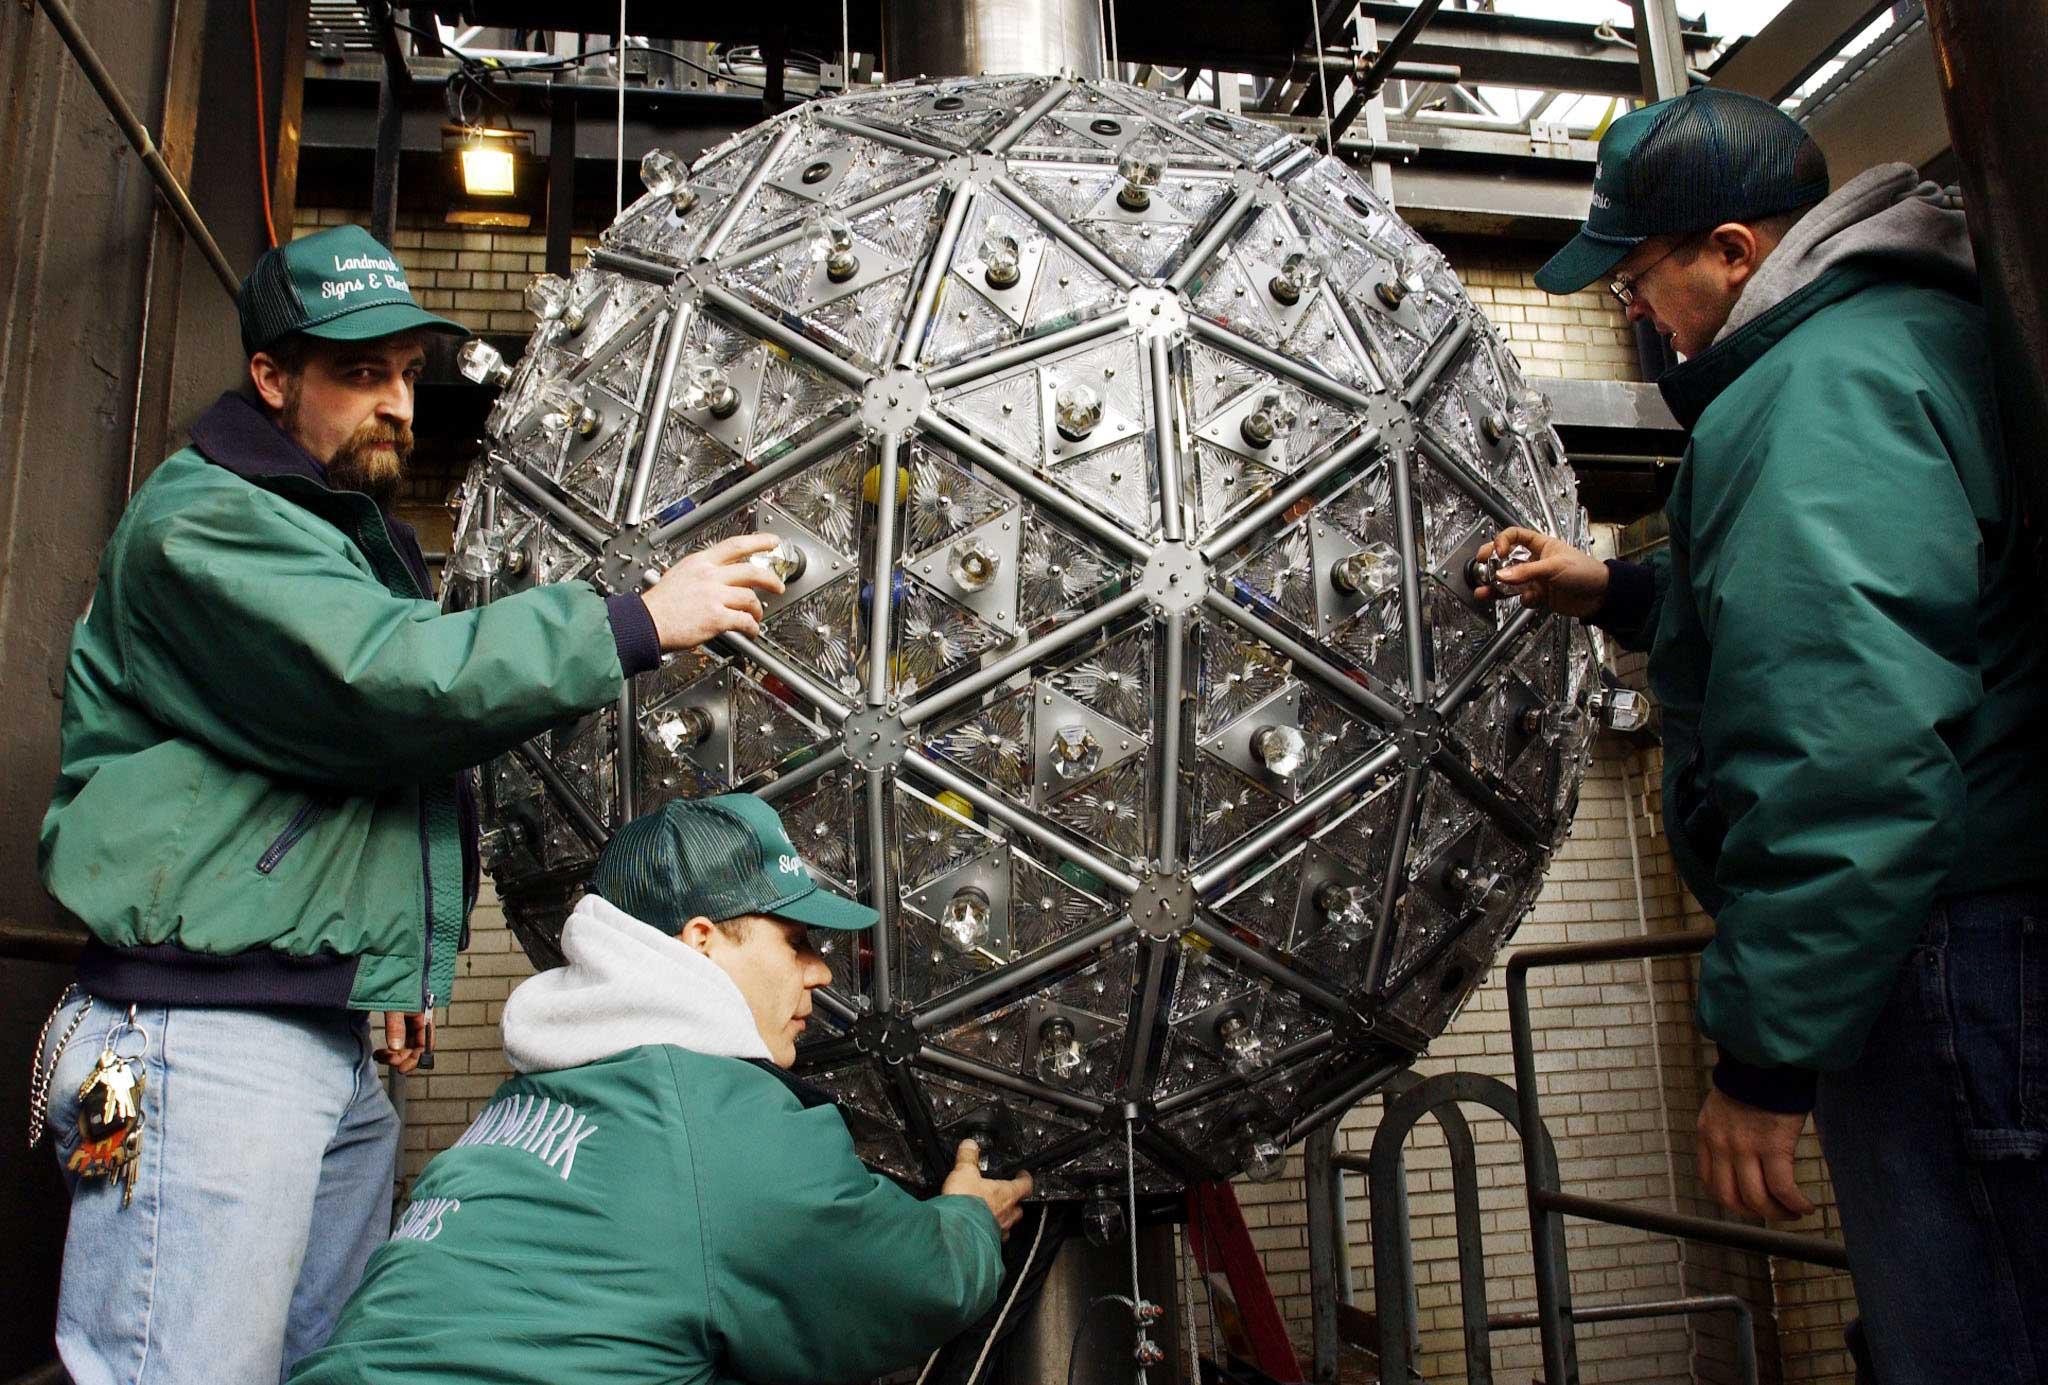 Peter Gravagna (L), Raymond Nieves (C) and Felix Ortega (R), of Landmark Signs, install light bulbs on the New Year's Eve Ball in New York City on Dec. 28, 2001.